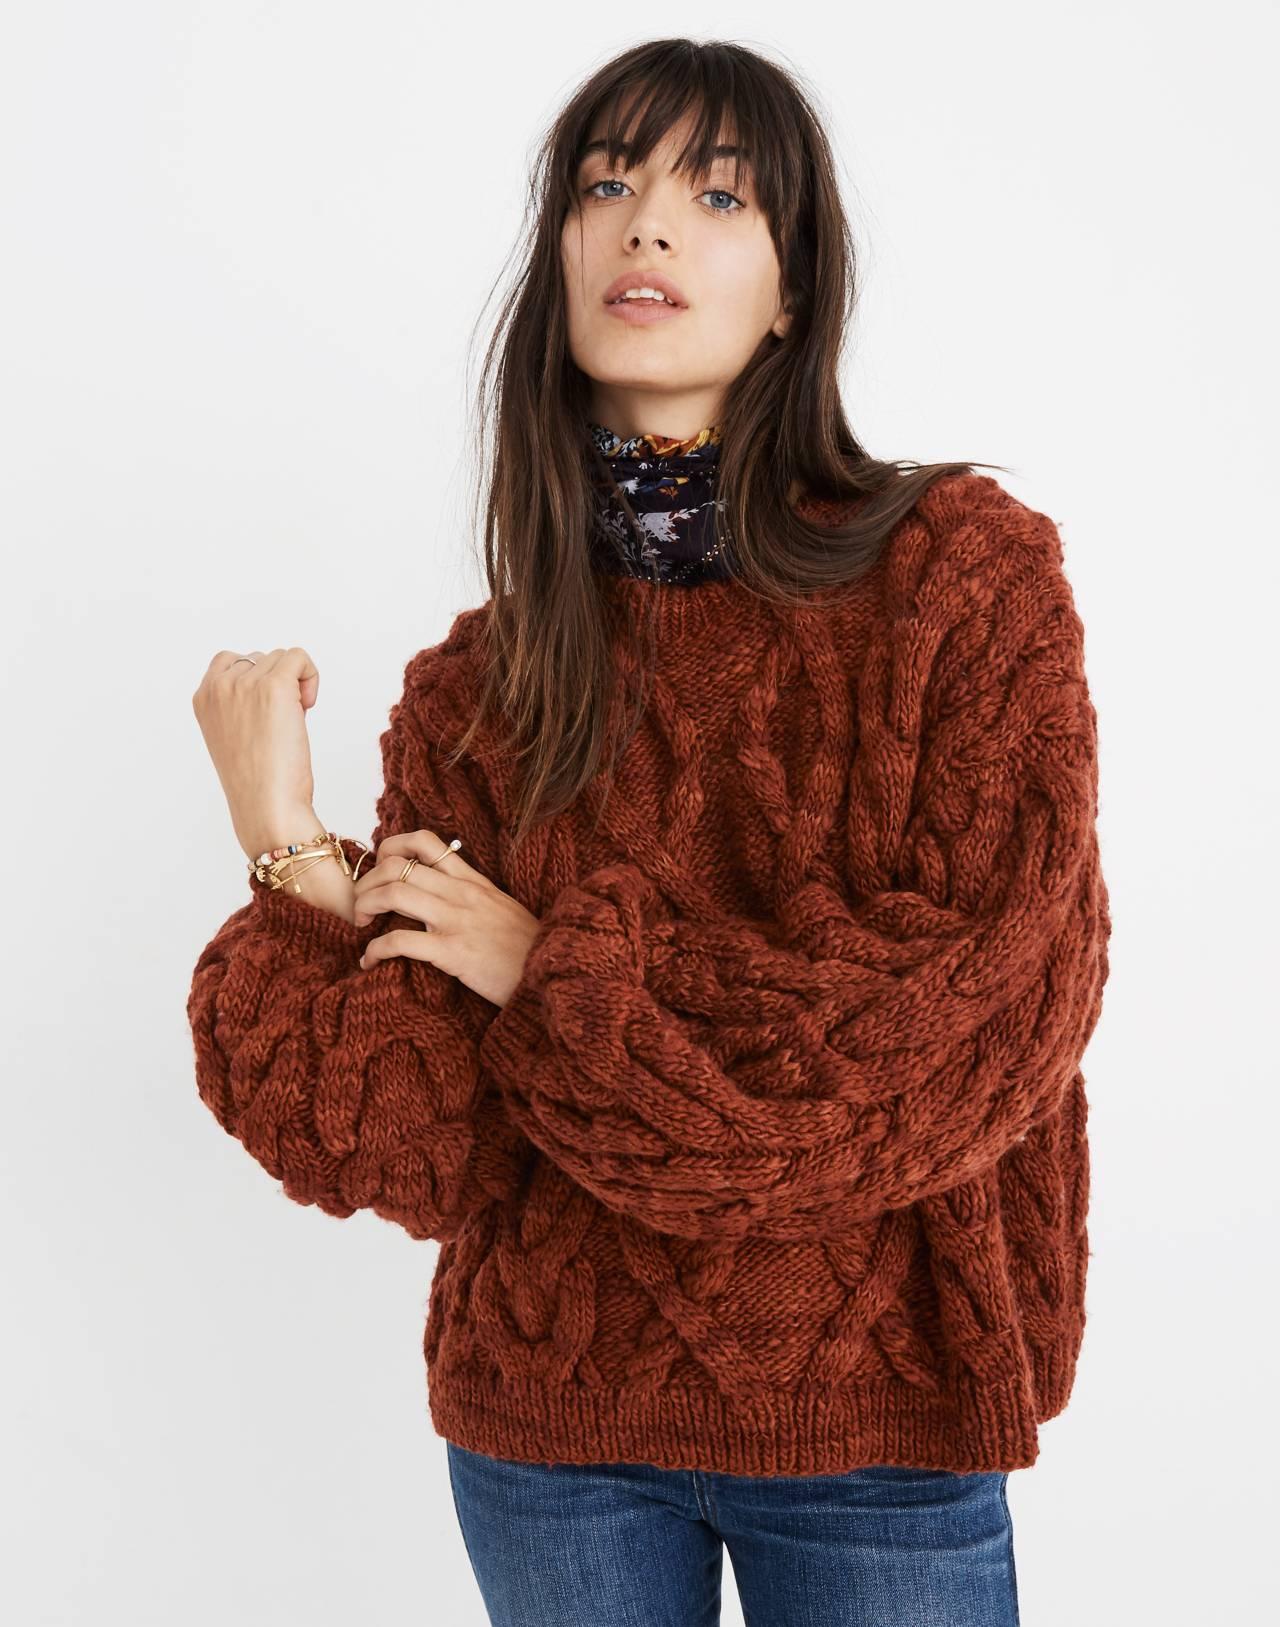 Madewell x Manos del Uruguay™ Cableknit Pullover in cinnamon image 2